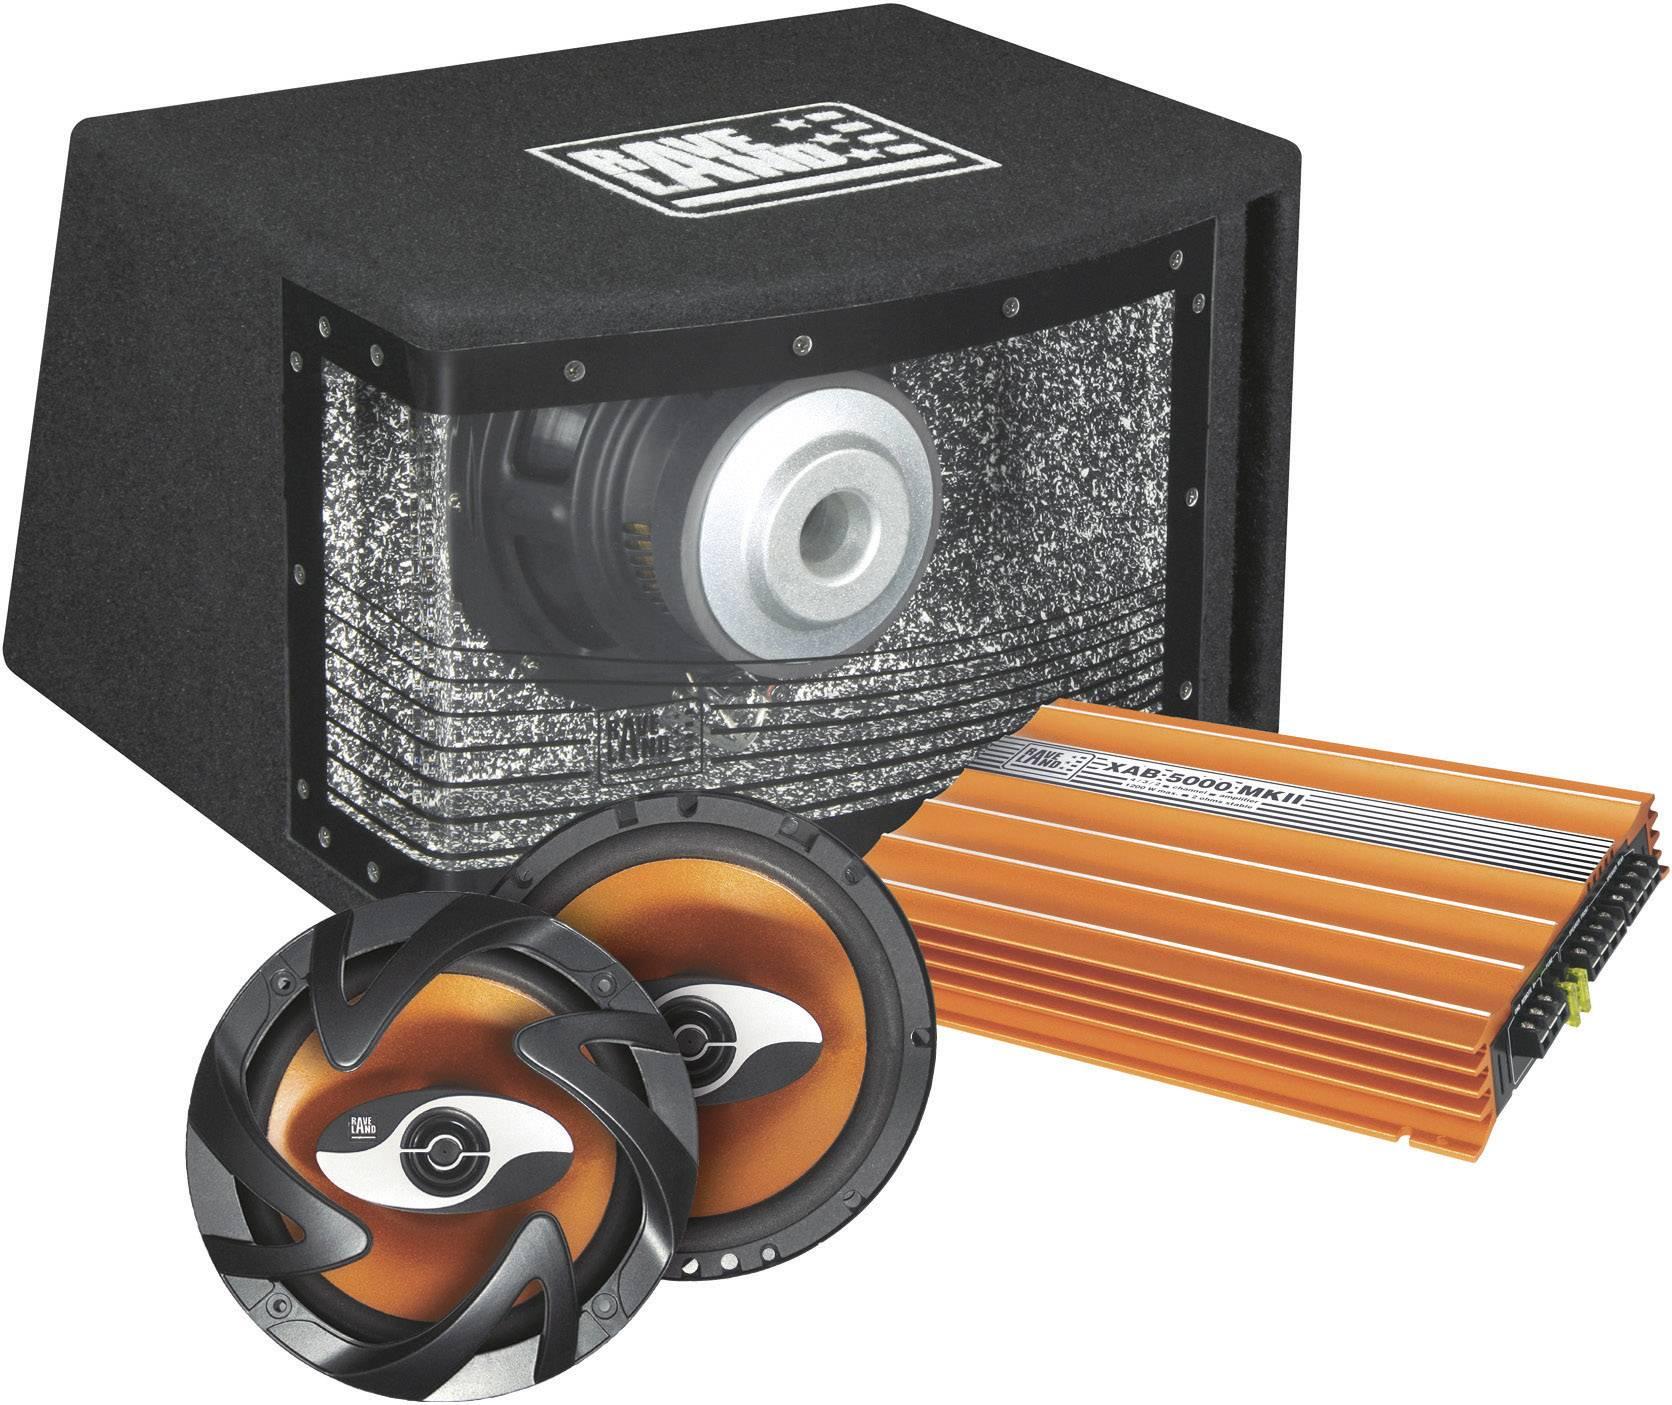 Hi-Fi sada do auta Raveland XAB-5000 MKII Orange Power, 4 x 300 W